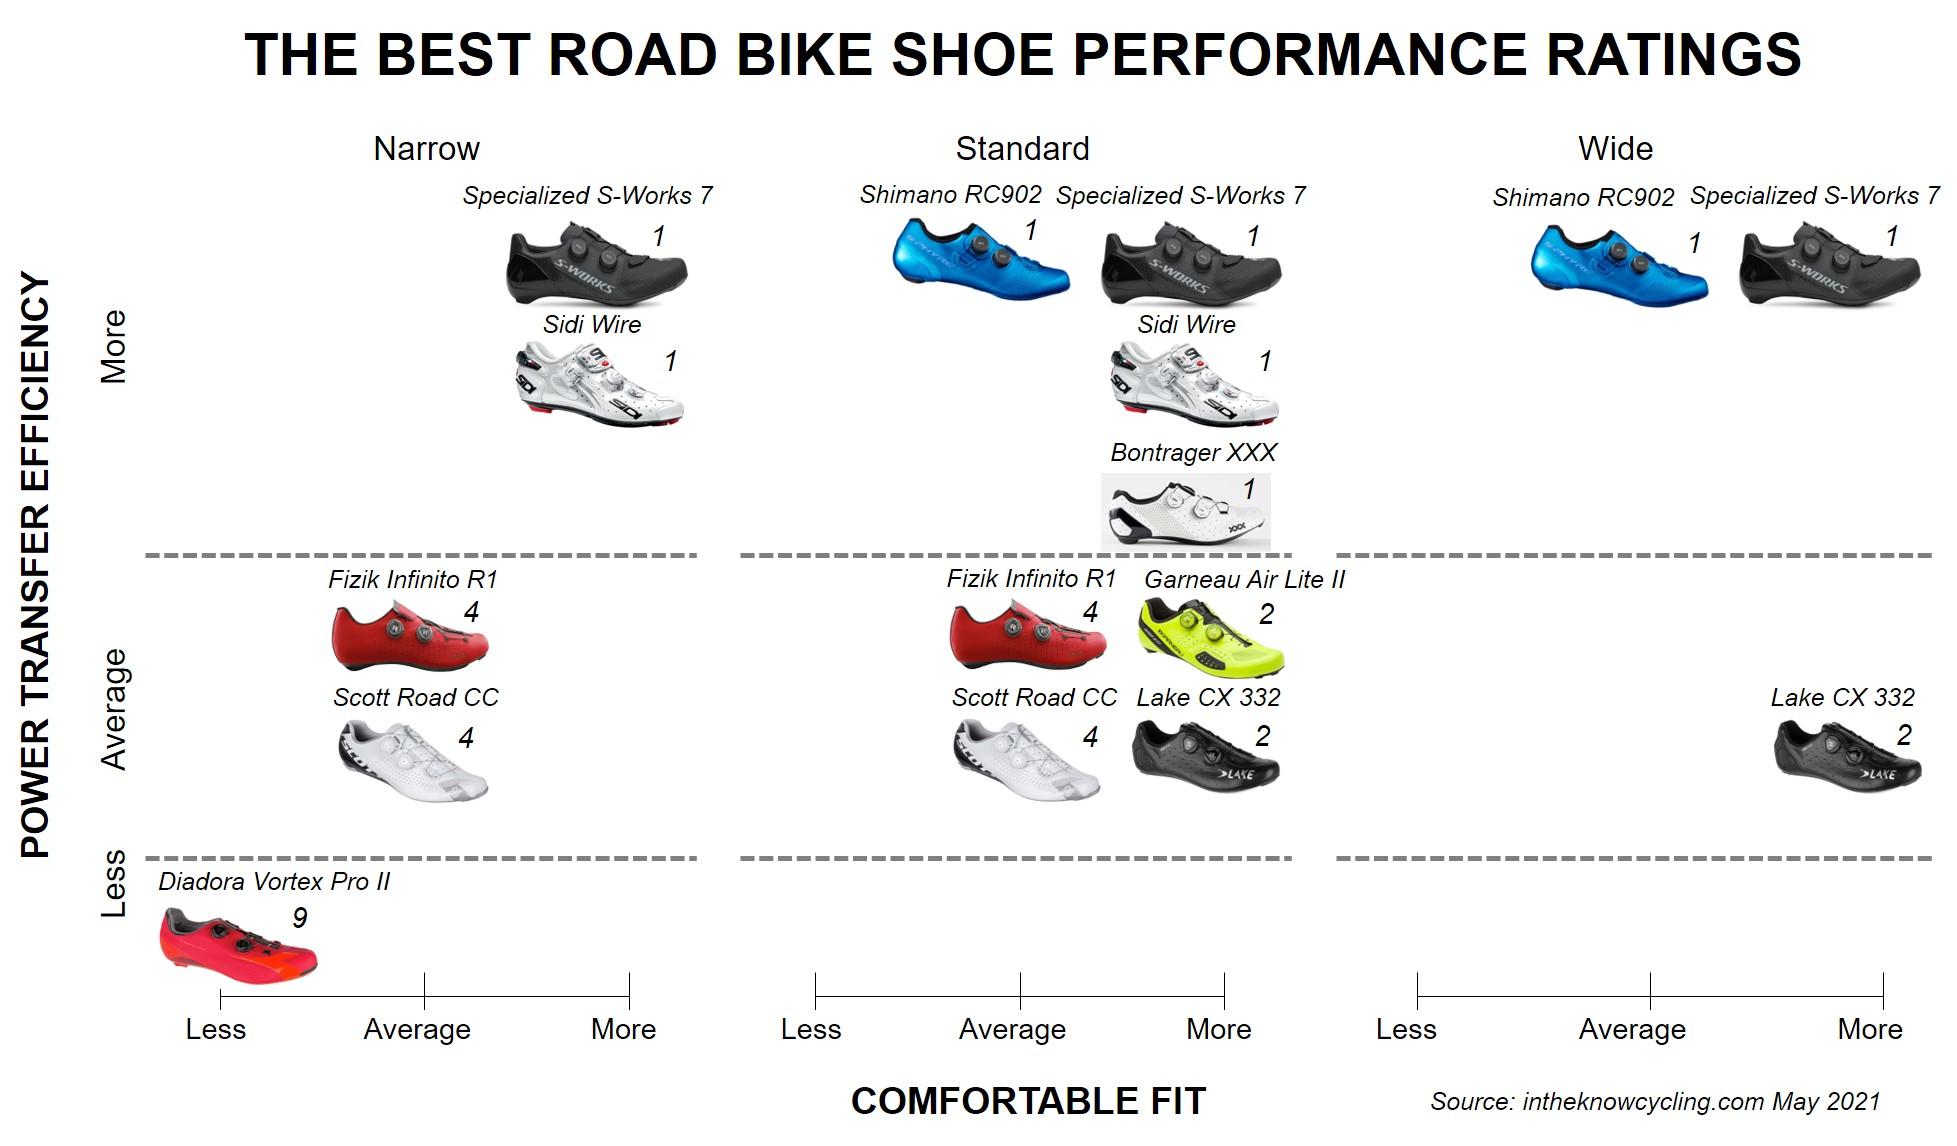 Road shoe performance ratings